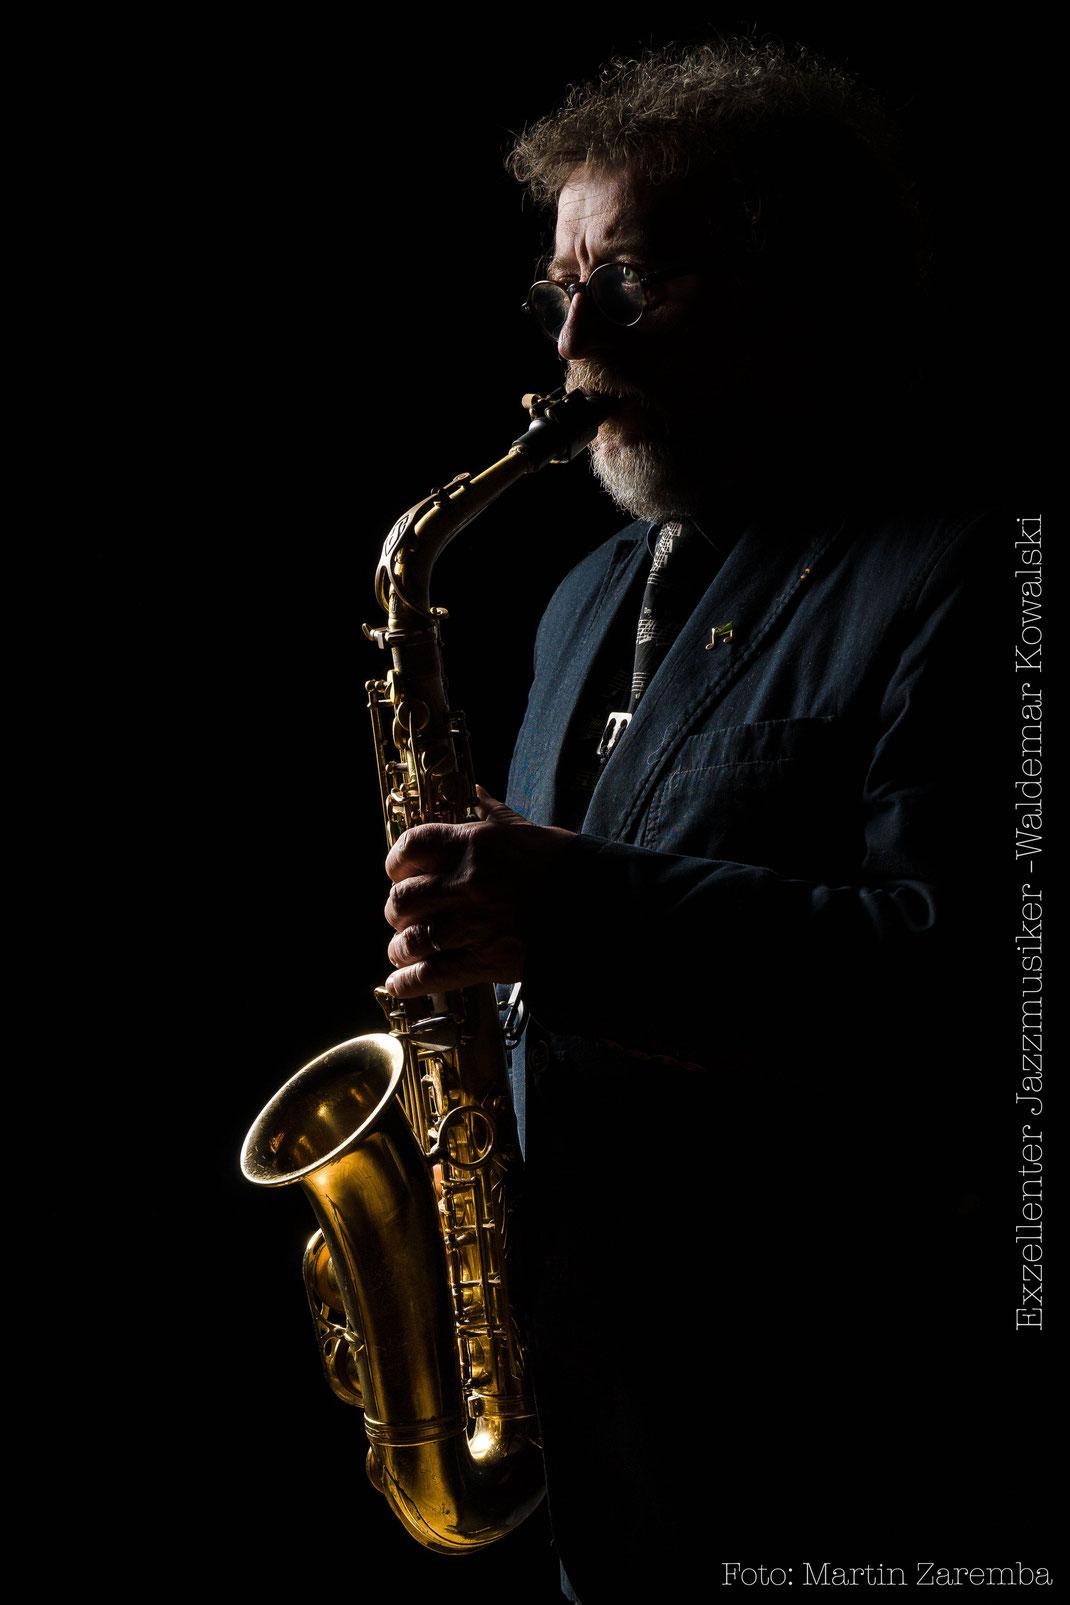 Portrait Jazzmusiker Waldemar Kowalski, Saxophone